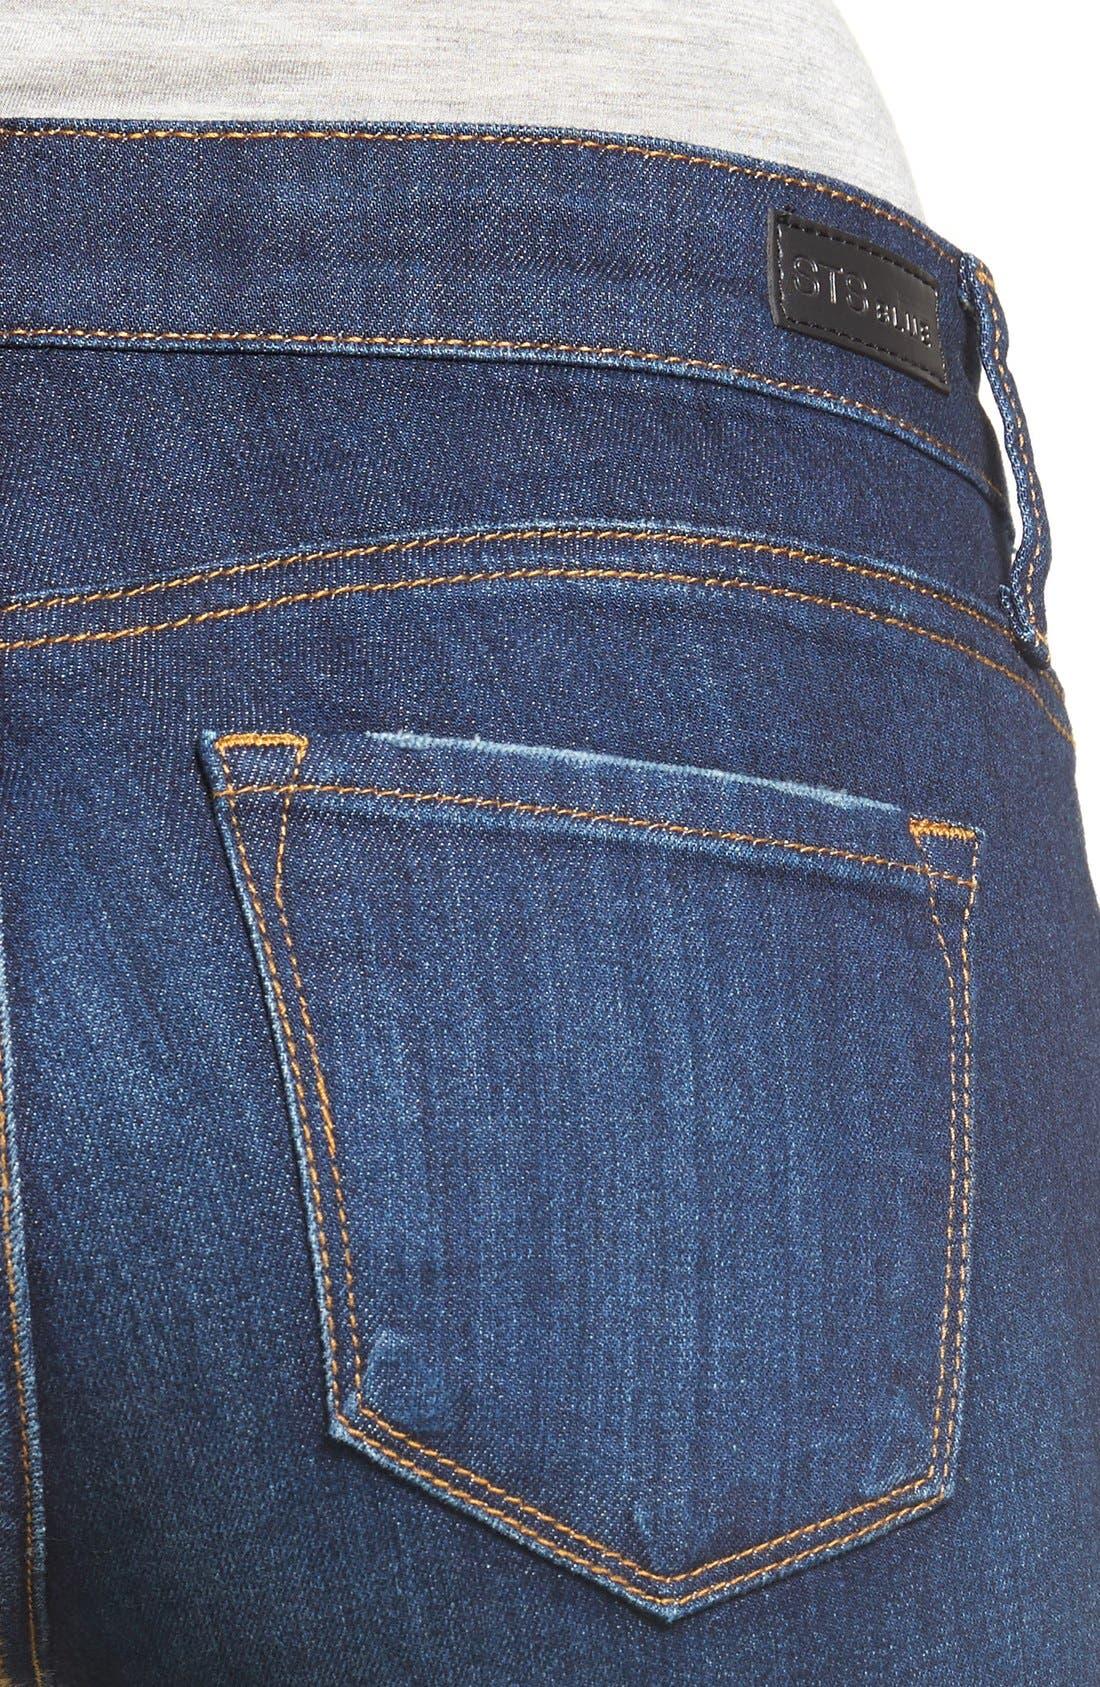 'Emma' Release Hem Skinny Jeans,                             Alternate thumbnail 4, color,                             East La Canada